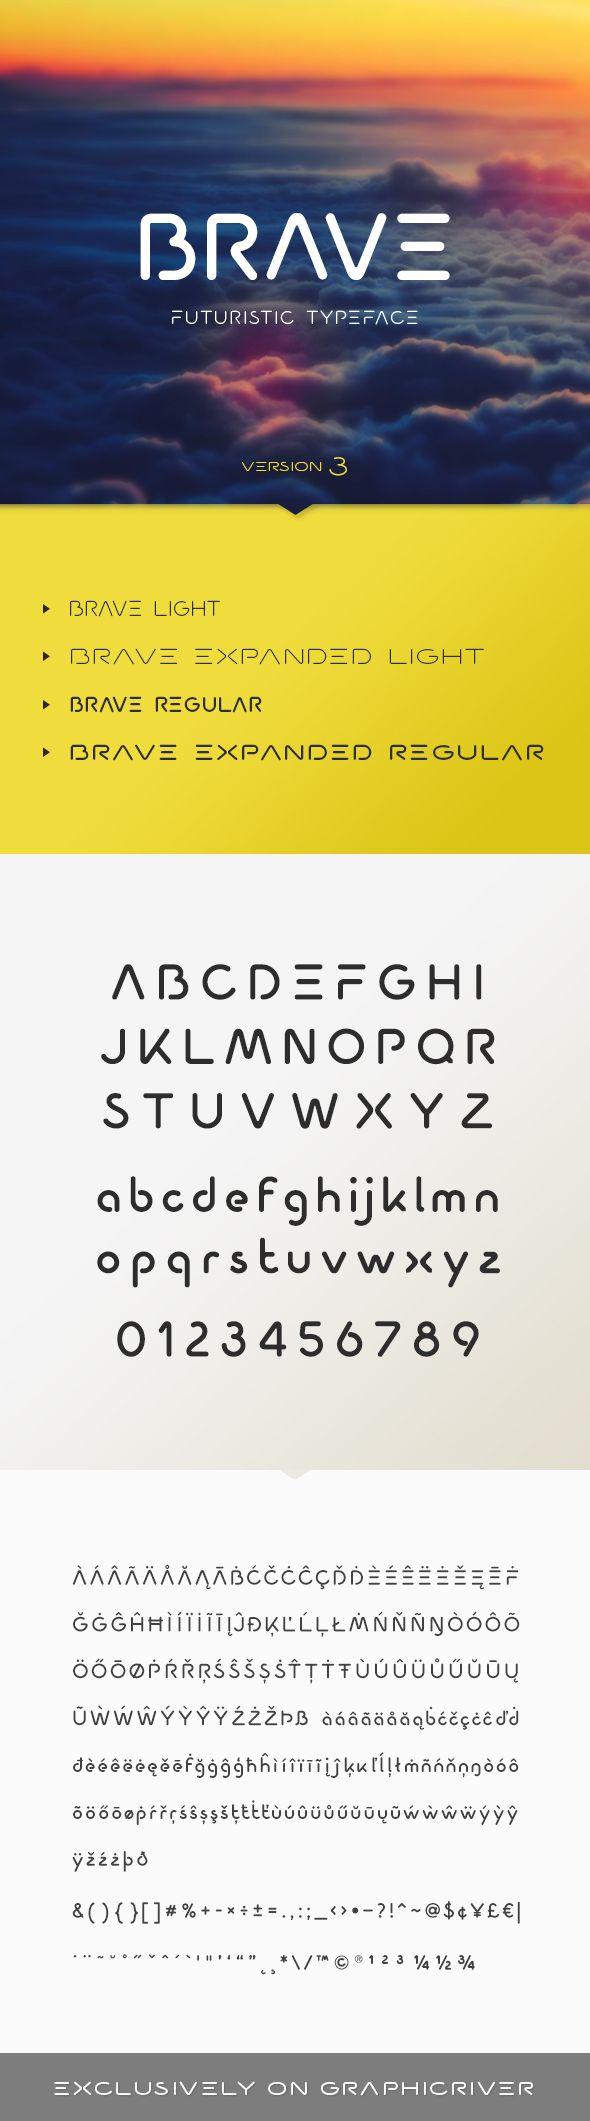 Brave Typeface - Futuristic Decorative | Download: http://graphicriver.net/item/brave-typeface/12058868?ref=sinzo